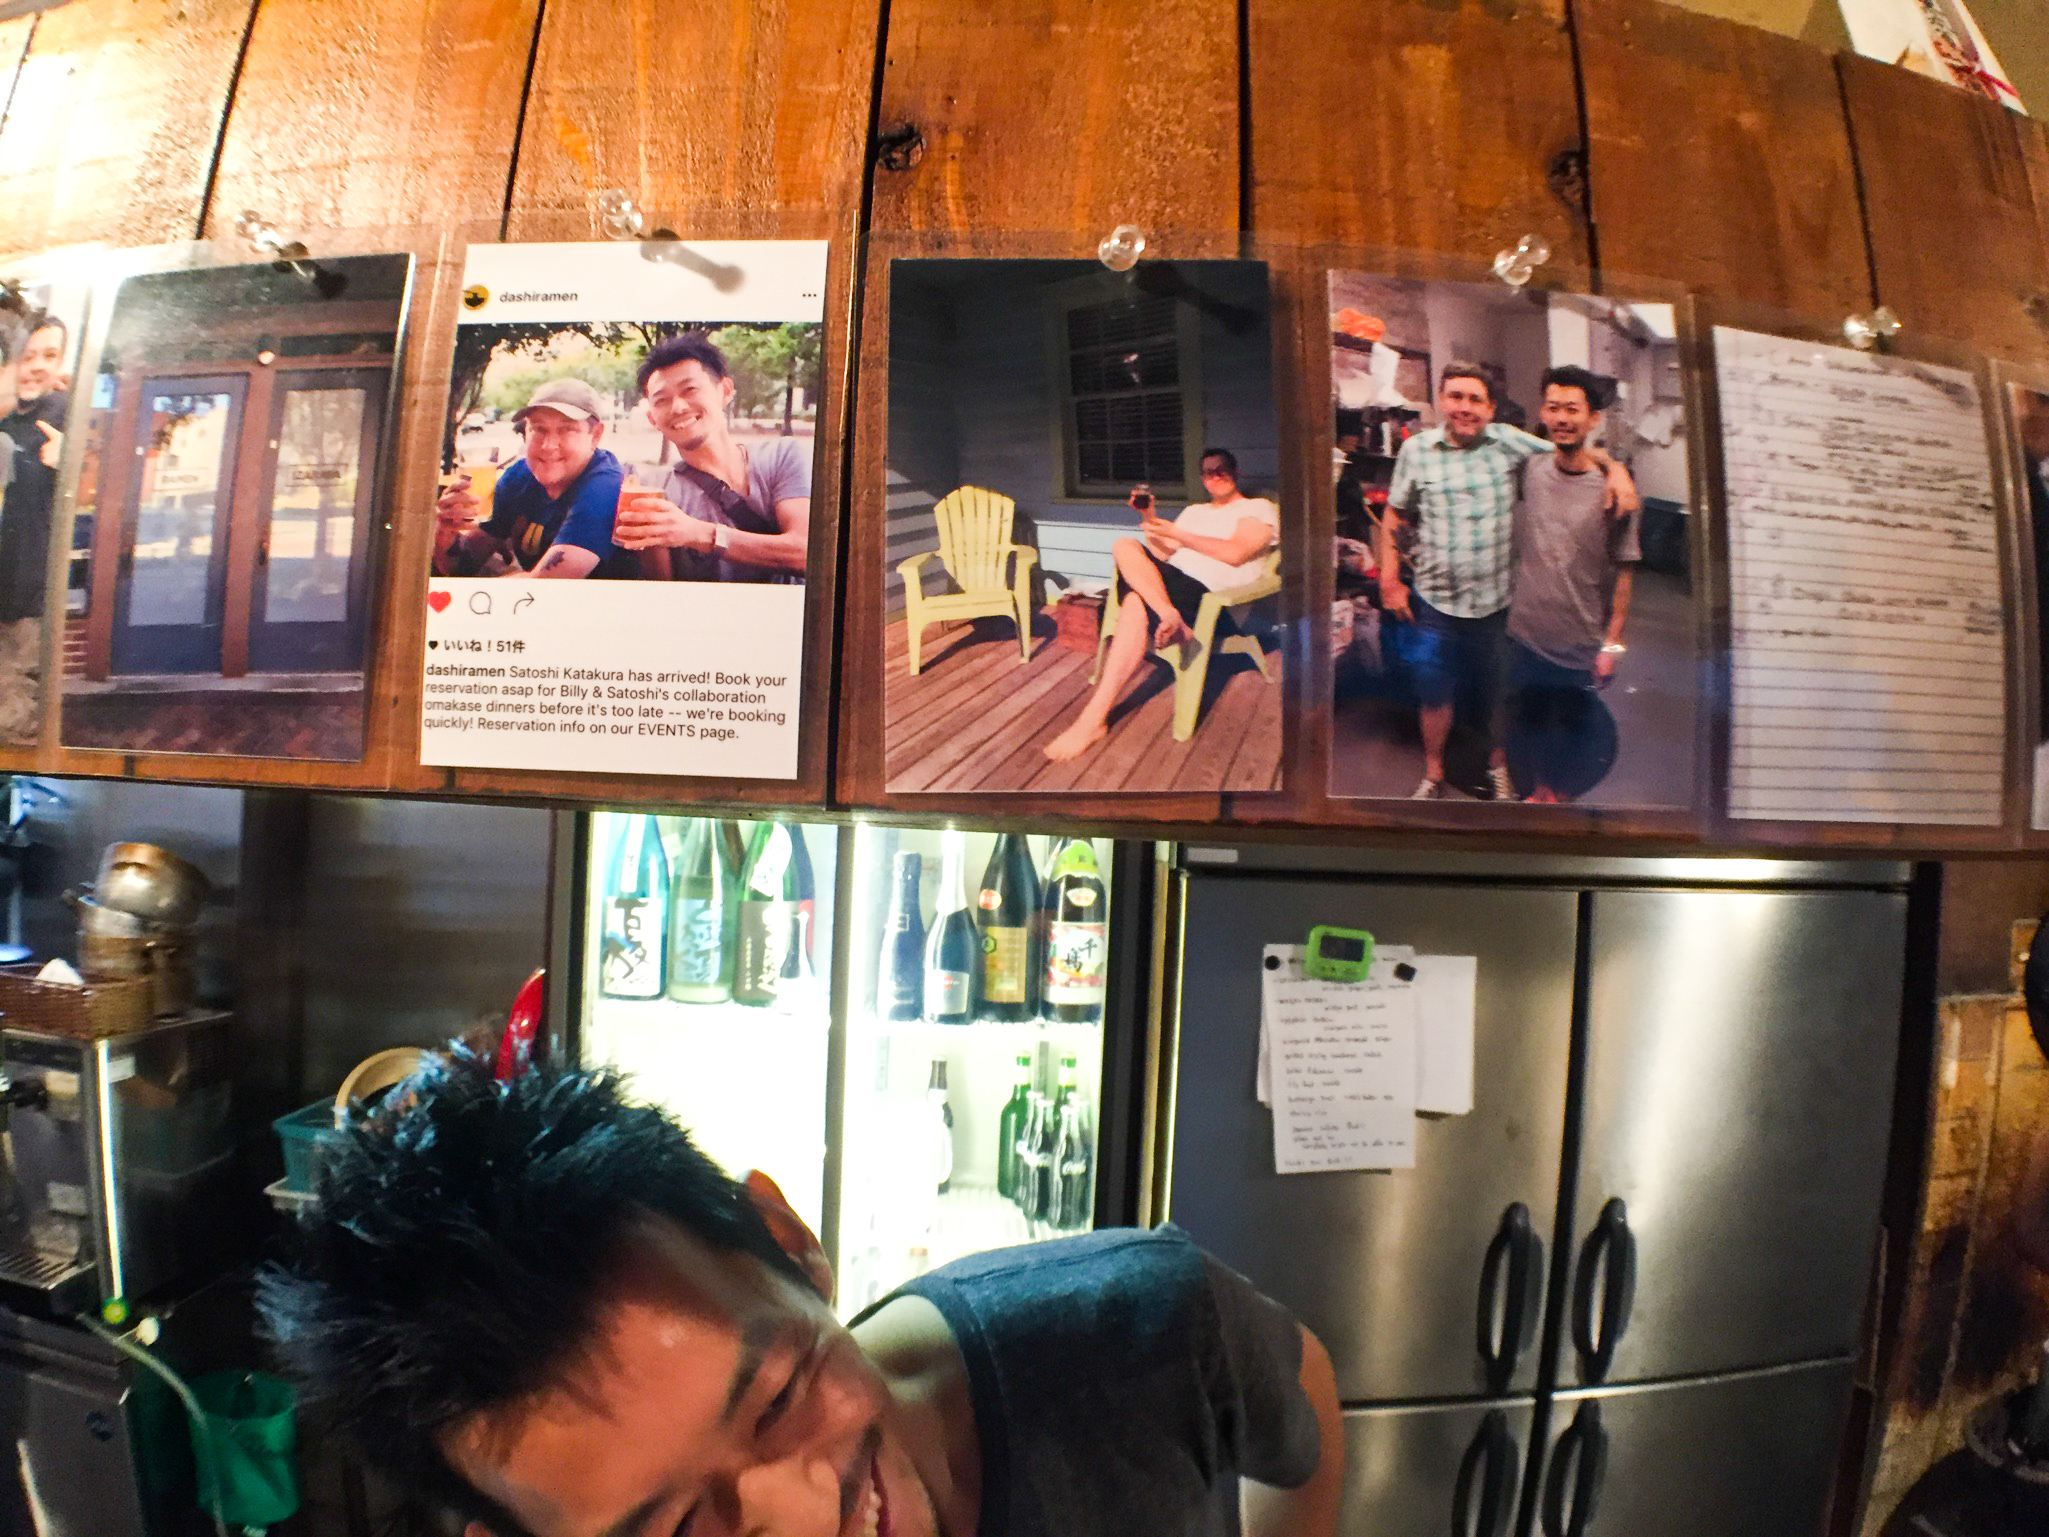 Pictures of his 2016 trip to Durham line the walls at Satoshi's Hiro izakaya